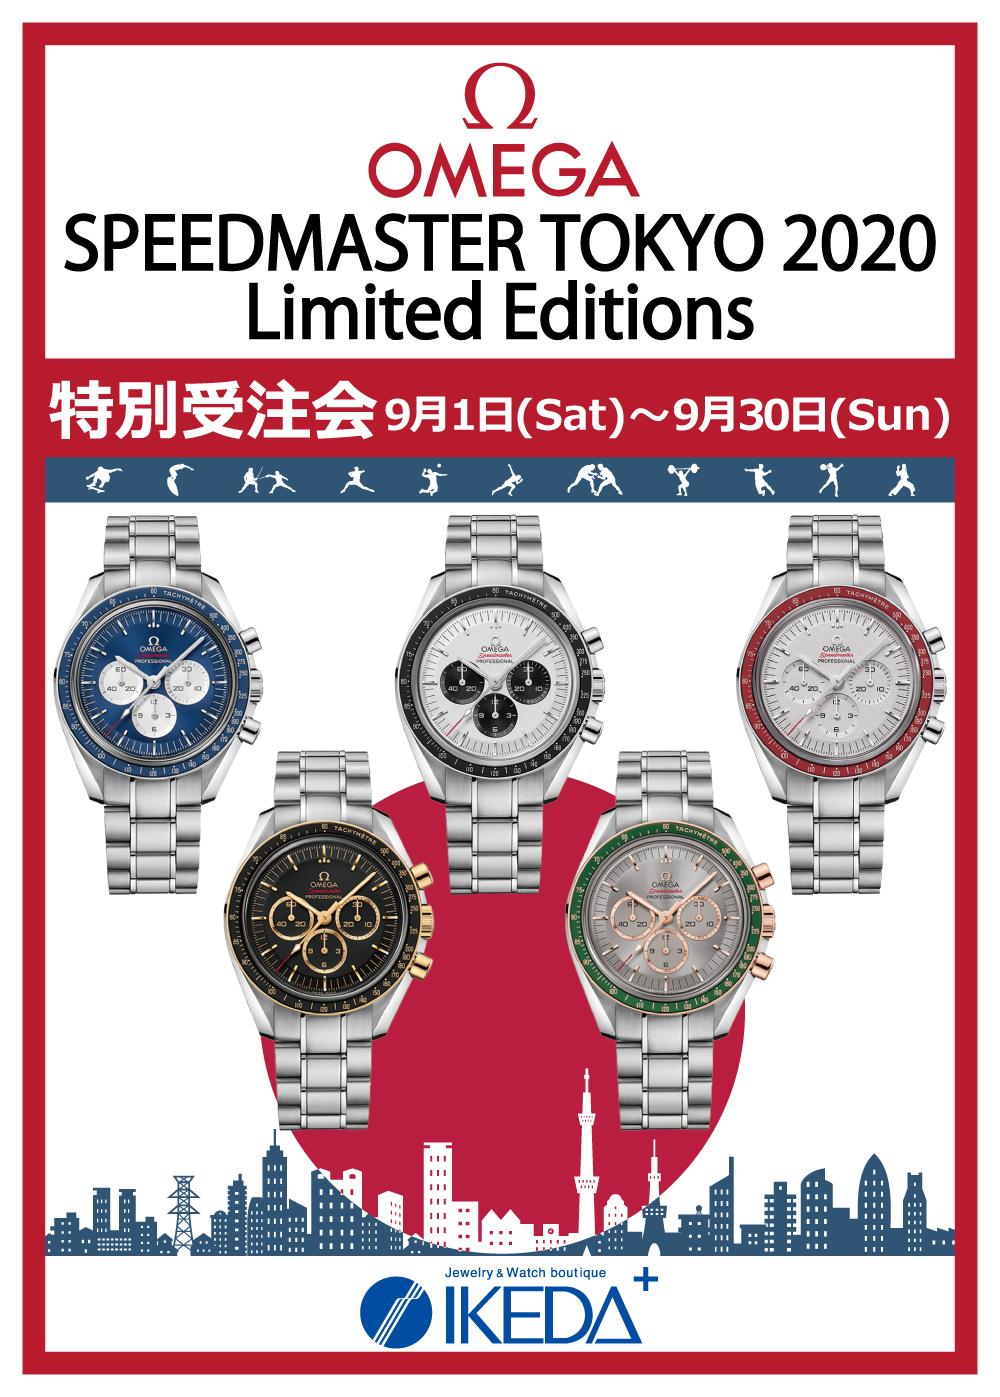 omega-tokyo2020fair